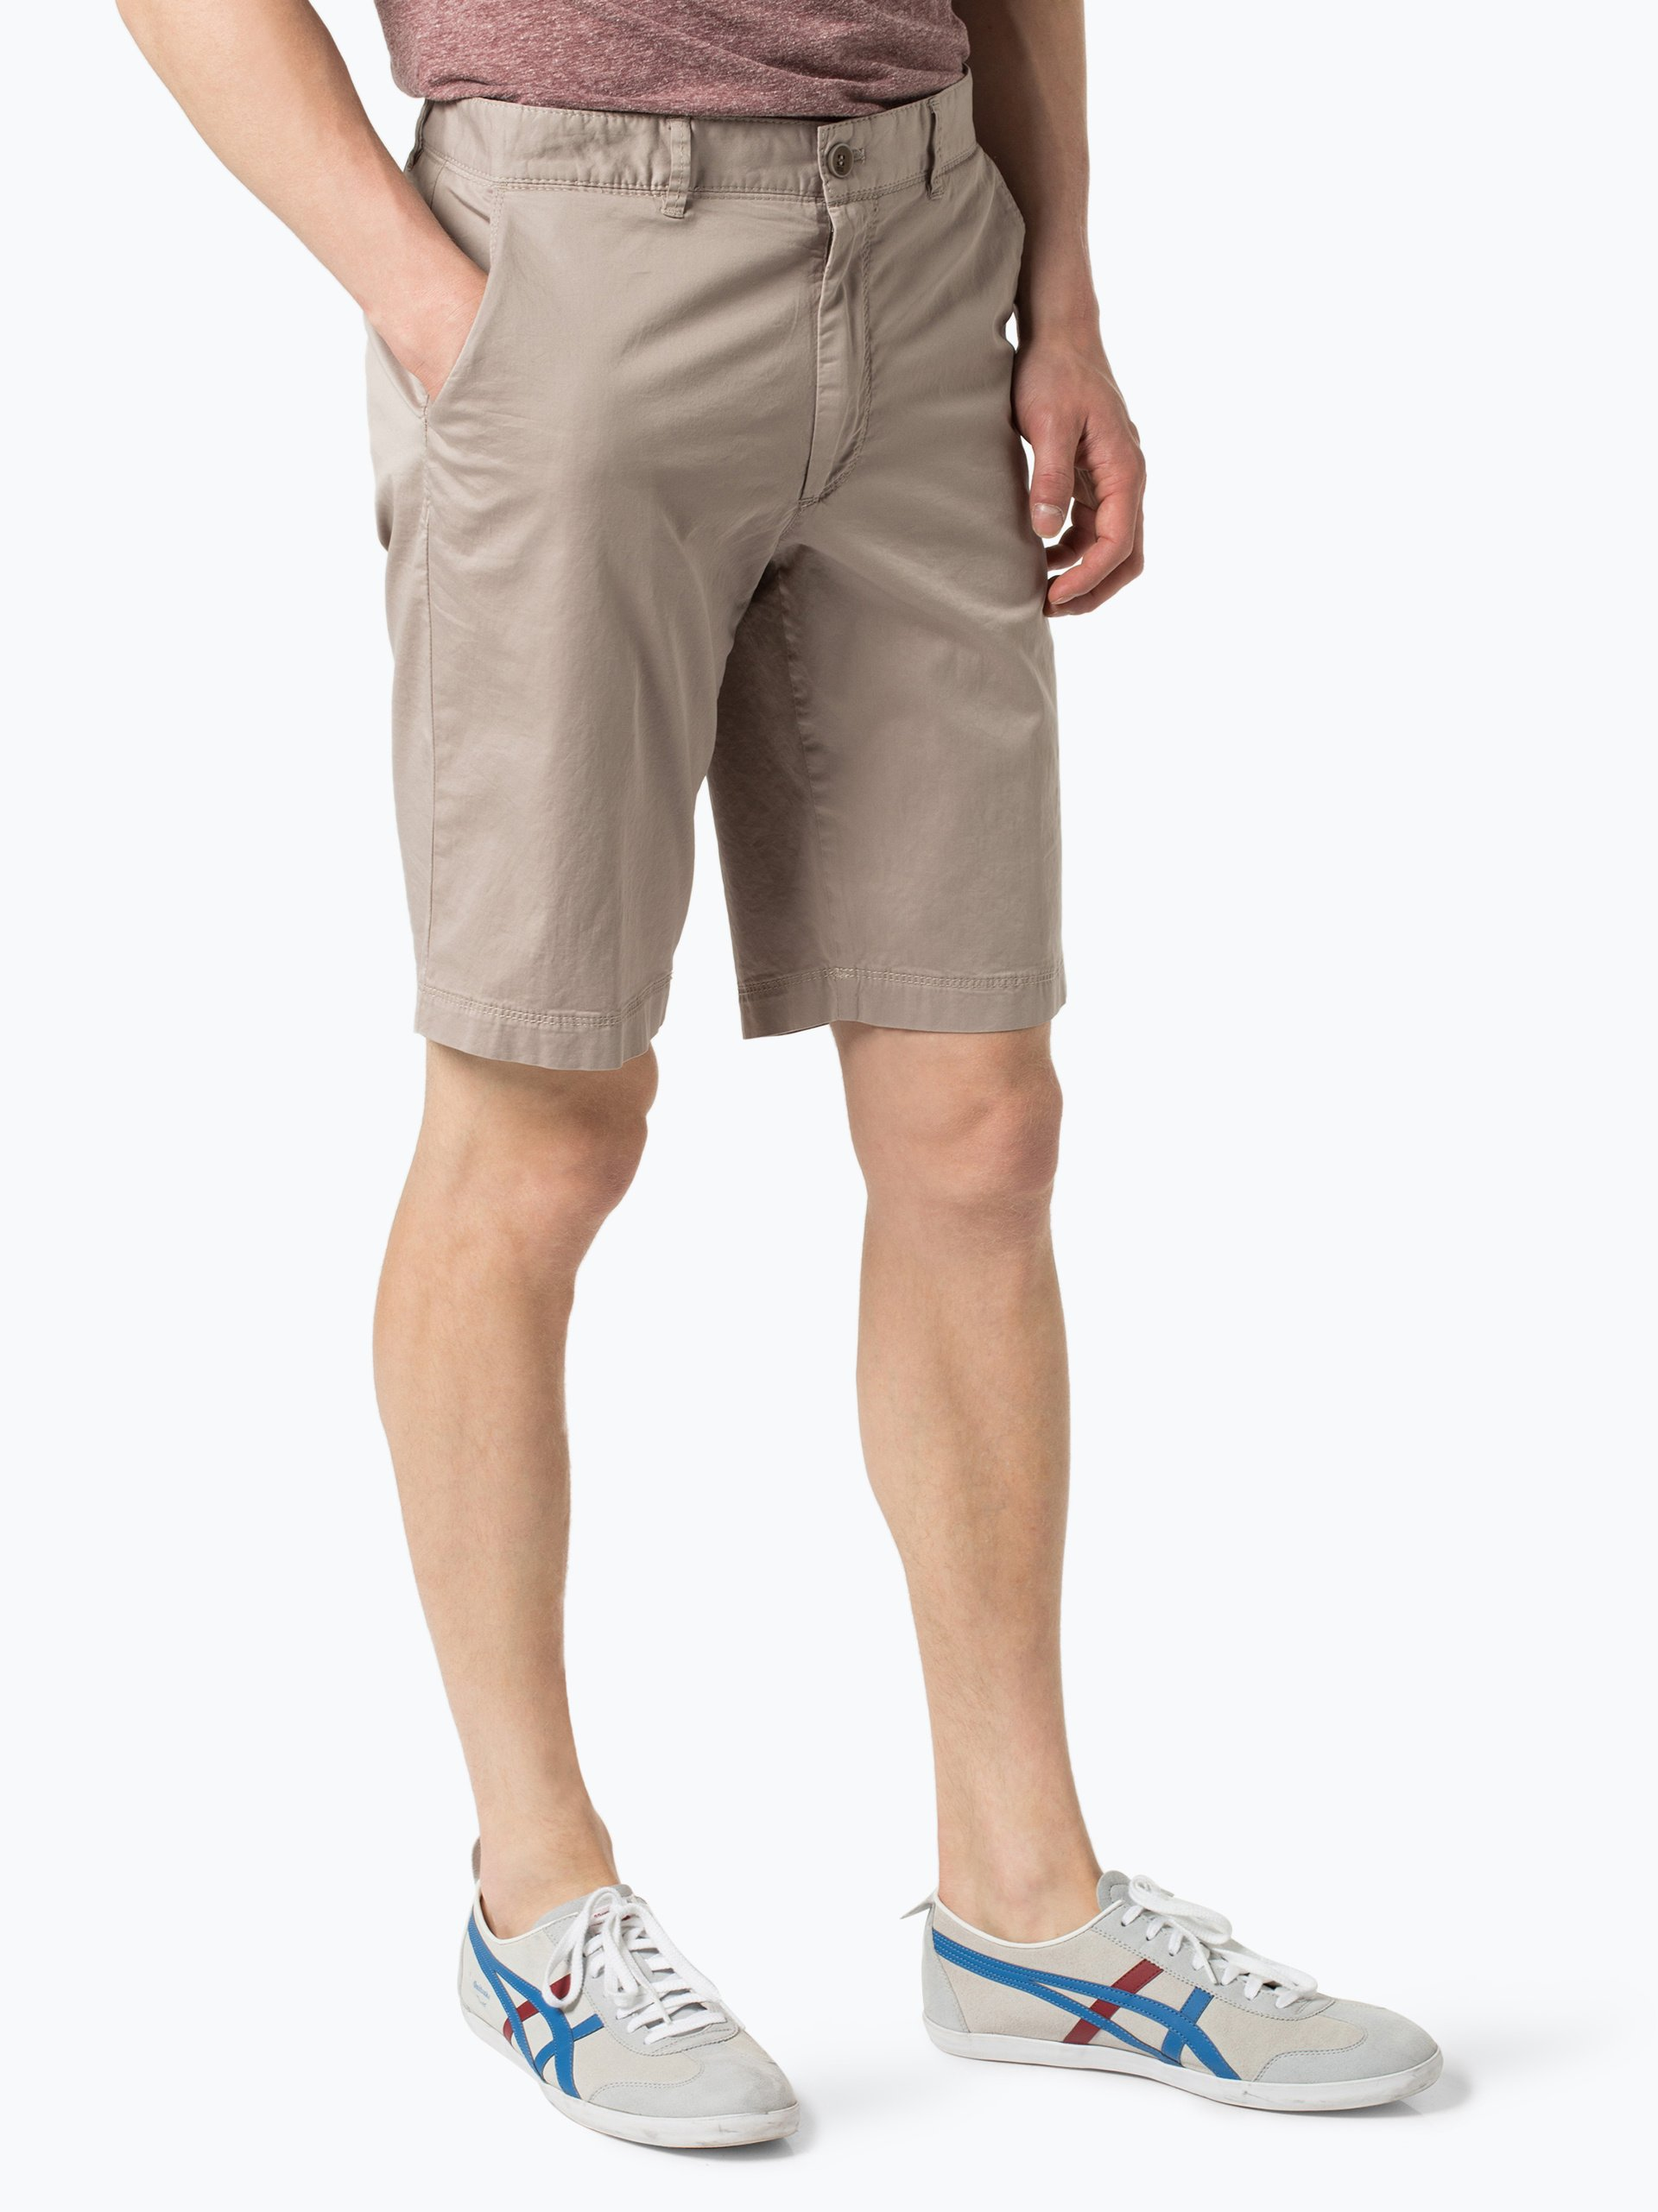 brax herren shorts bozen sand uni online kaufen vangraaf com. Black Bedroom Furniture Sets. Home Design Ideas